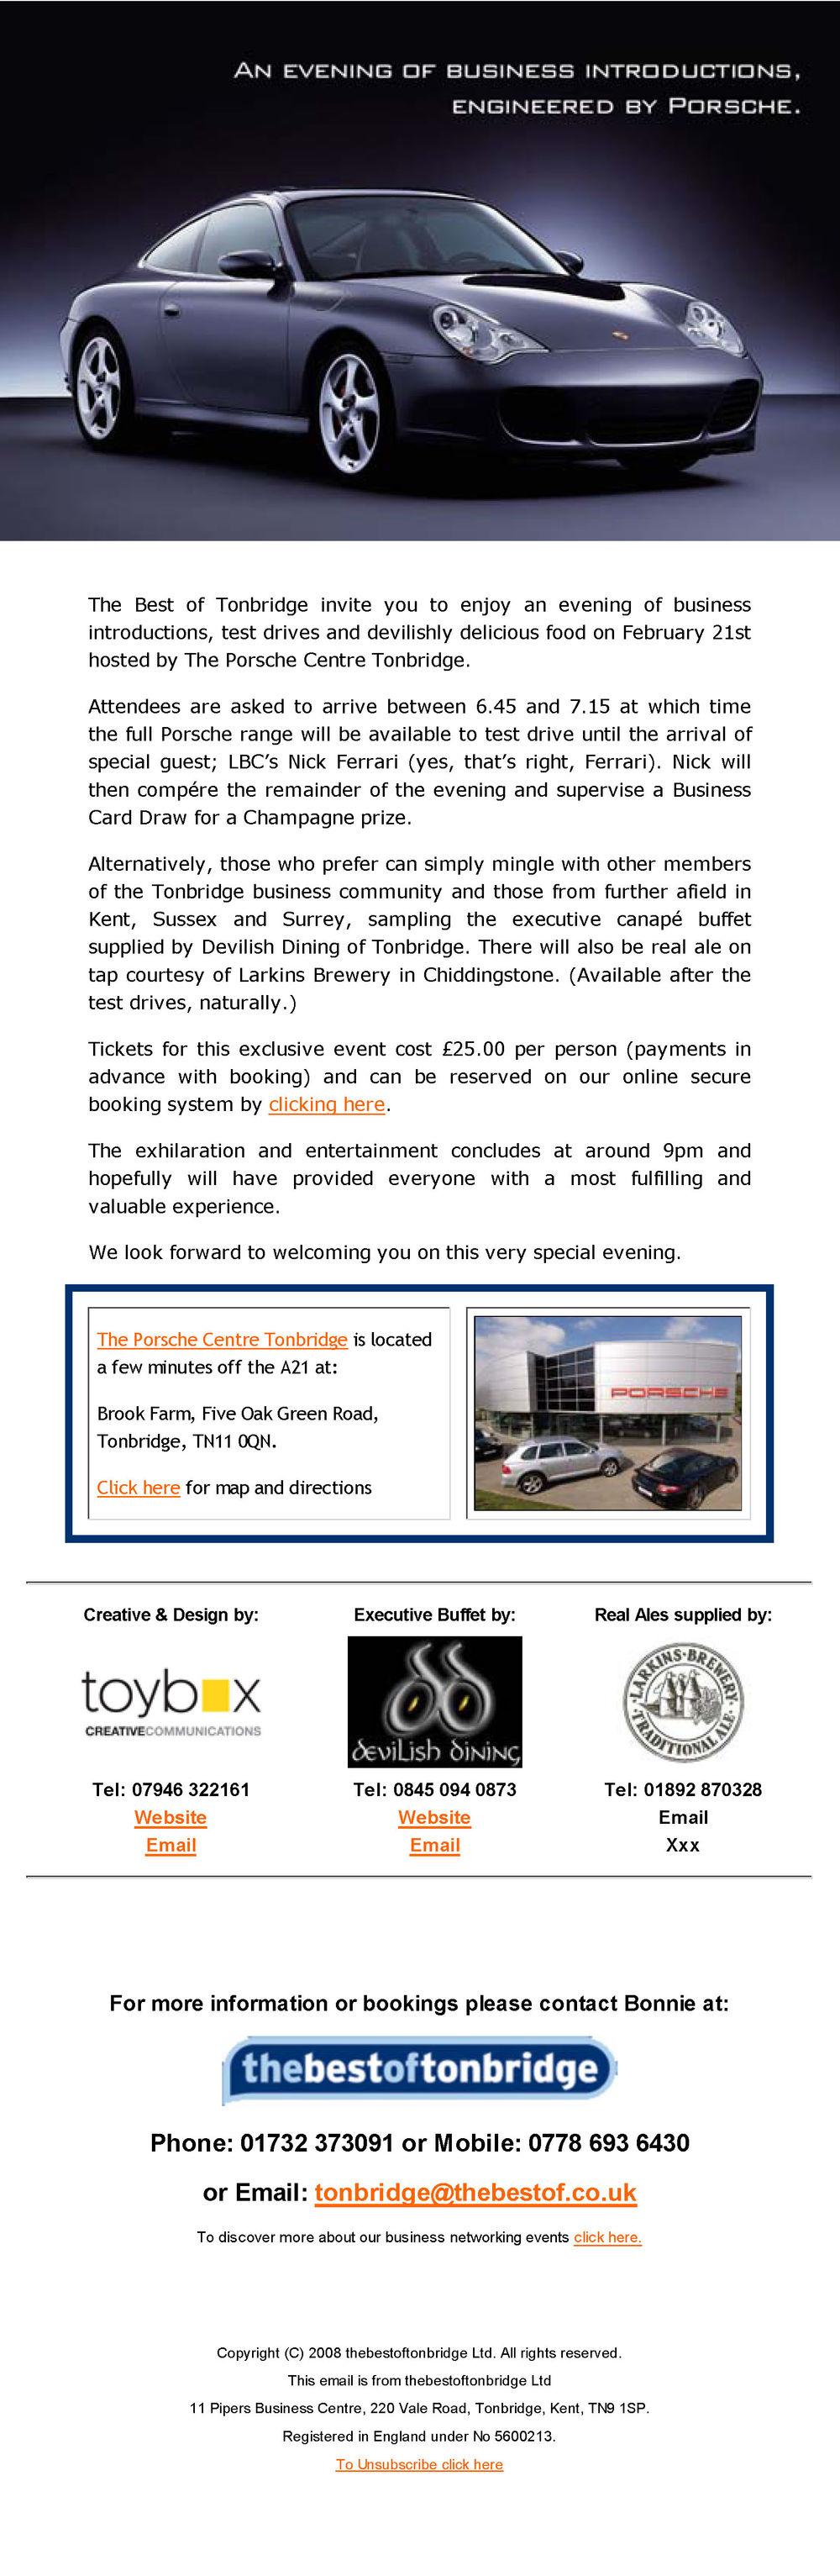 toybox_creative_porsche_best_of_tonbridge_email_campaign_Page_1.jpg